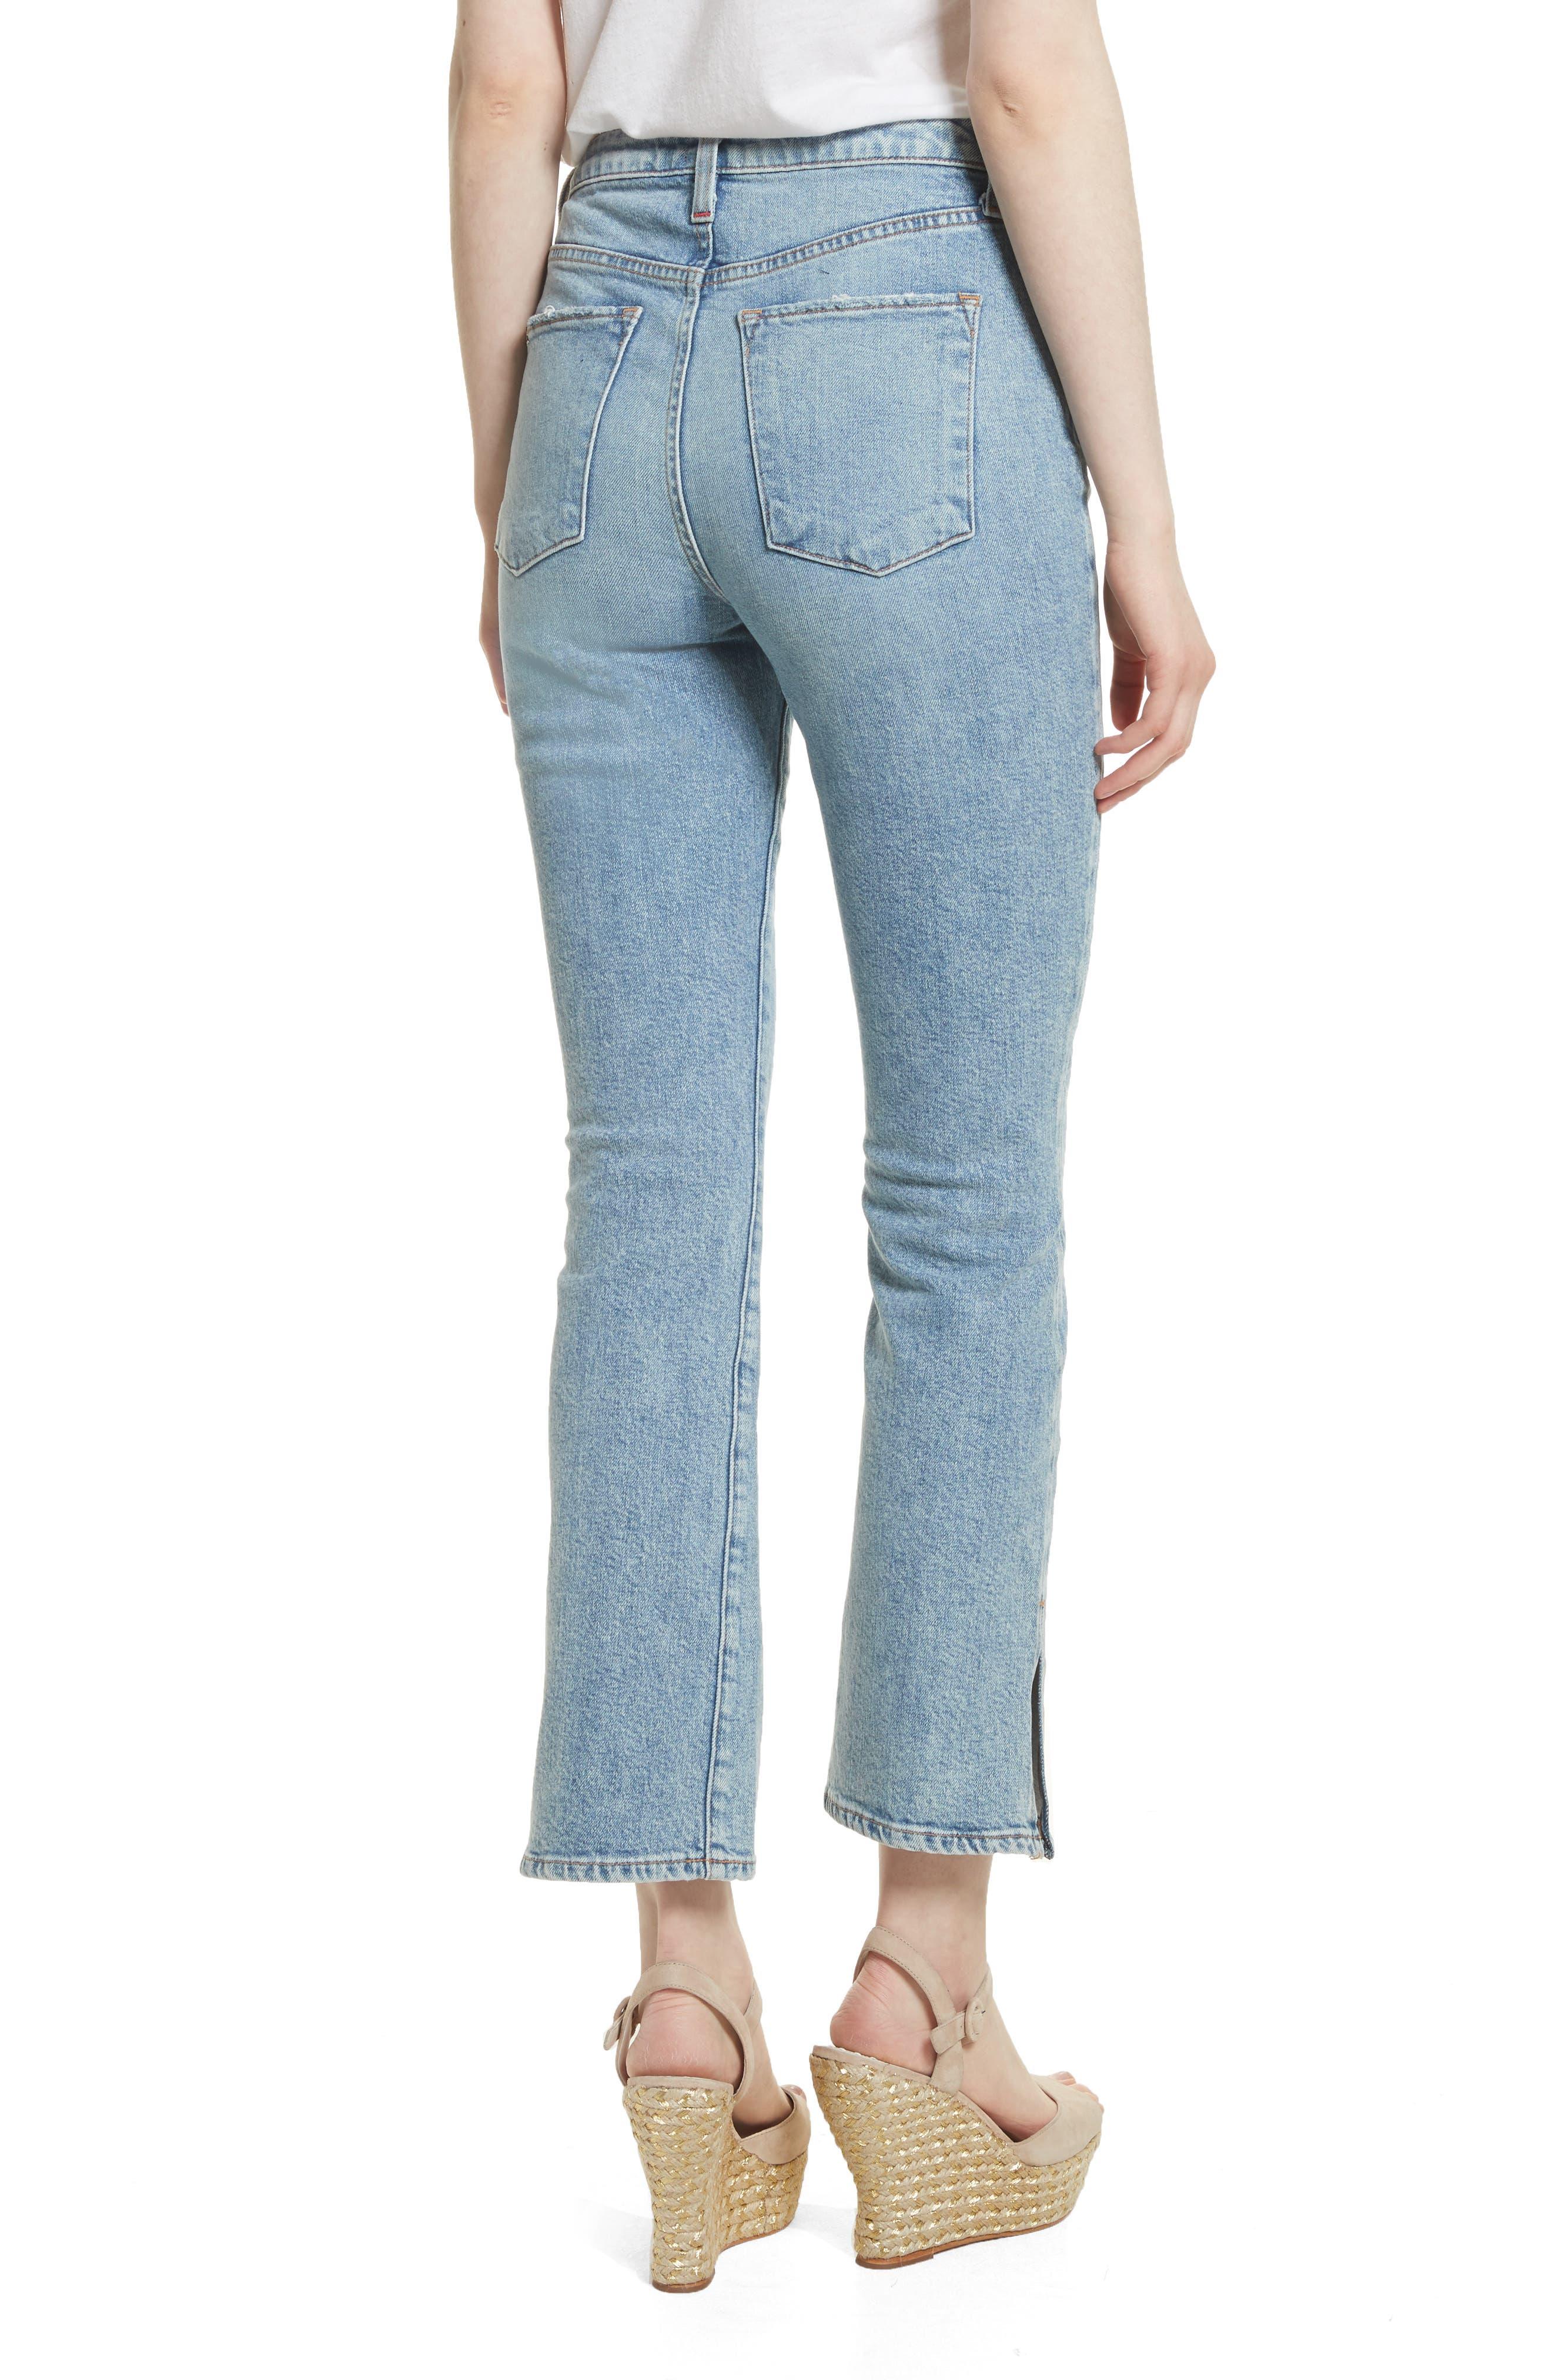 AO.LA Fabulous High Waist Baby Bootcut Jeans,                             Alternate thumbnail 2, color,